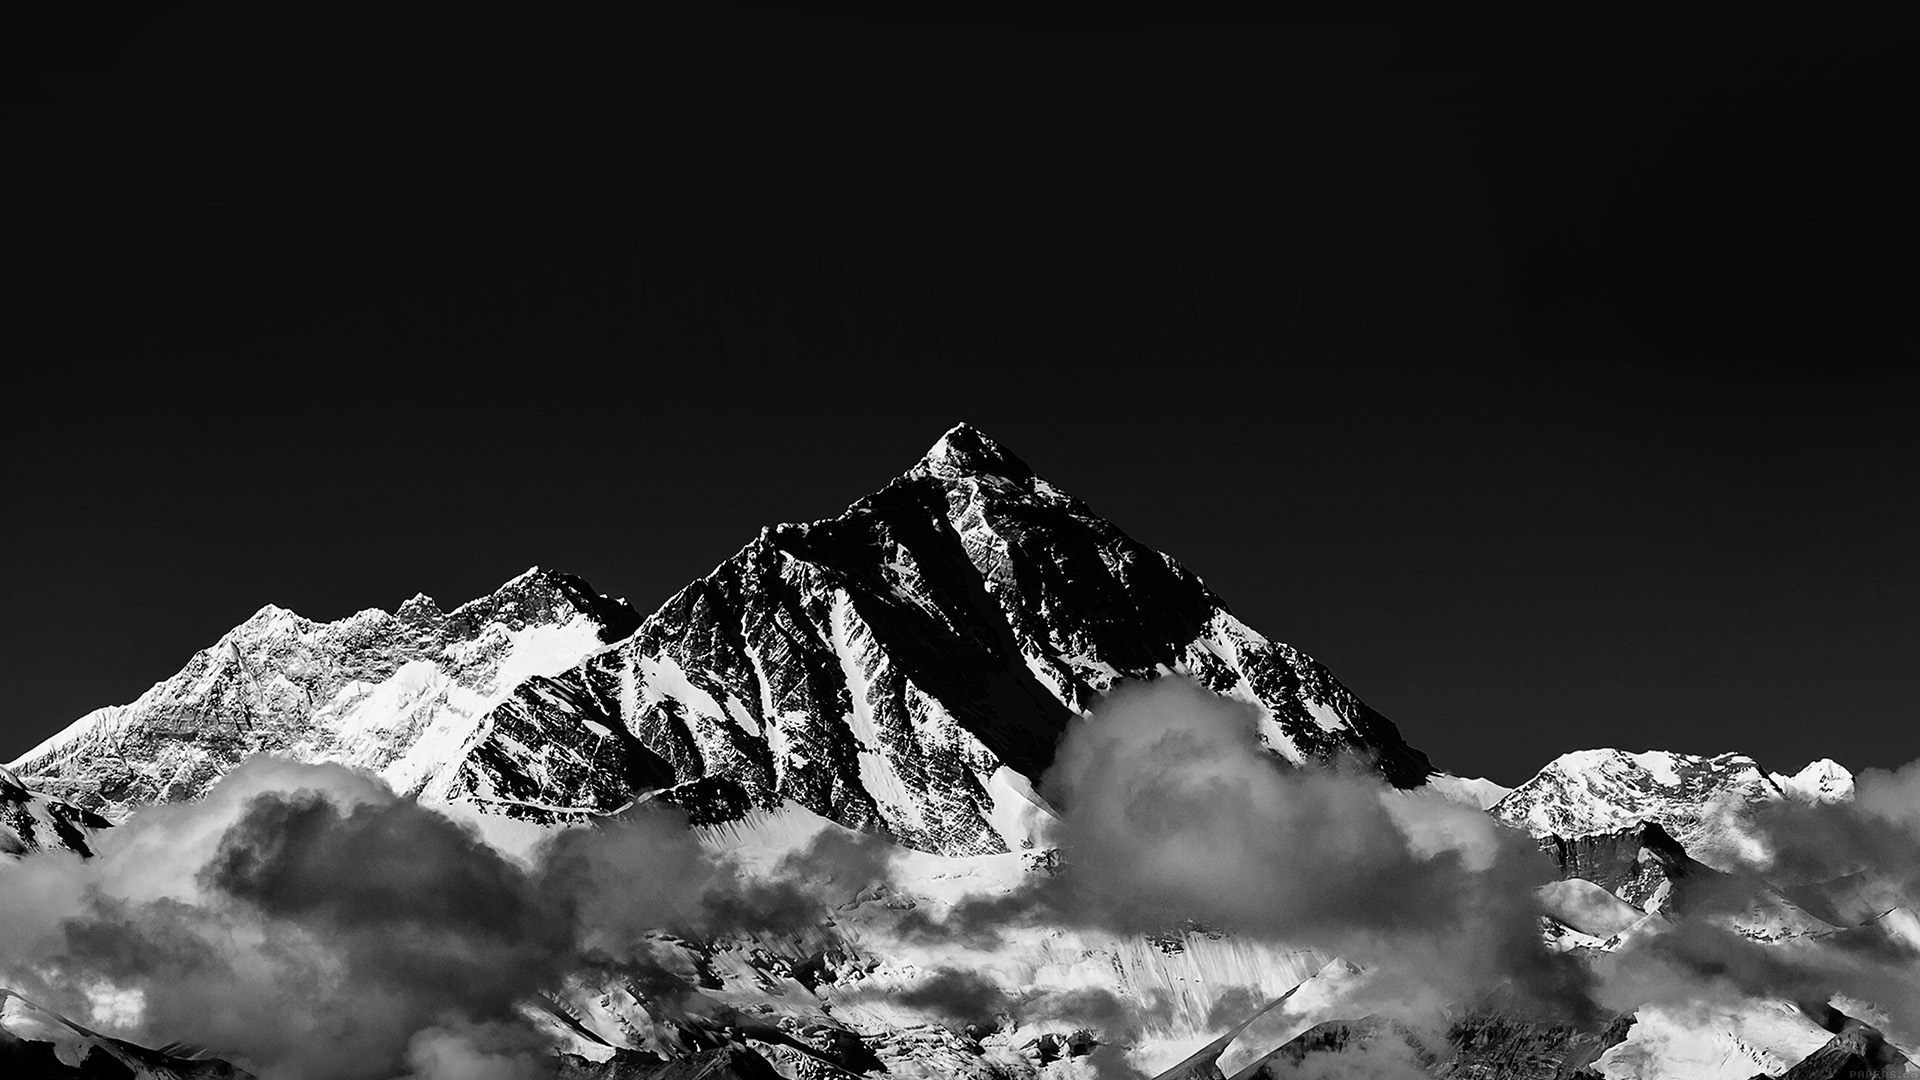 Mr57 Snow Solo Mountain High Nature Dark Bw Wallpaper